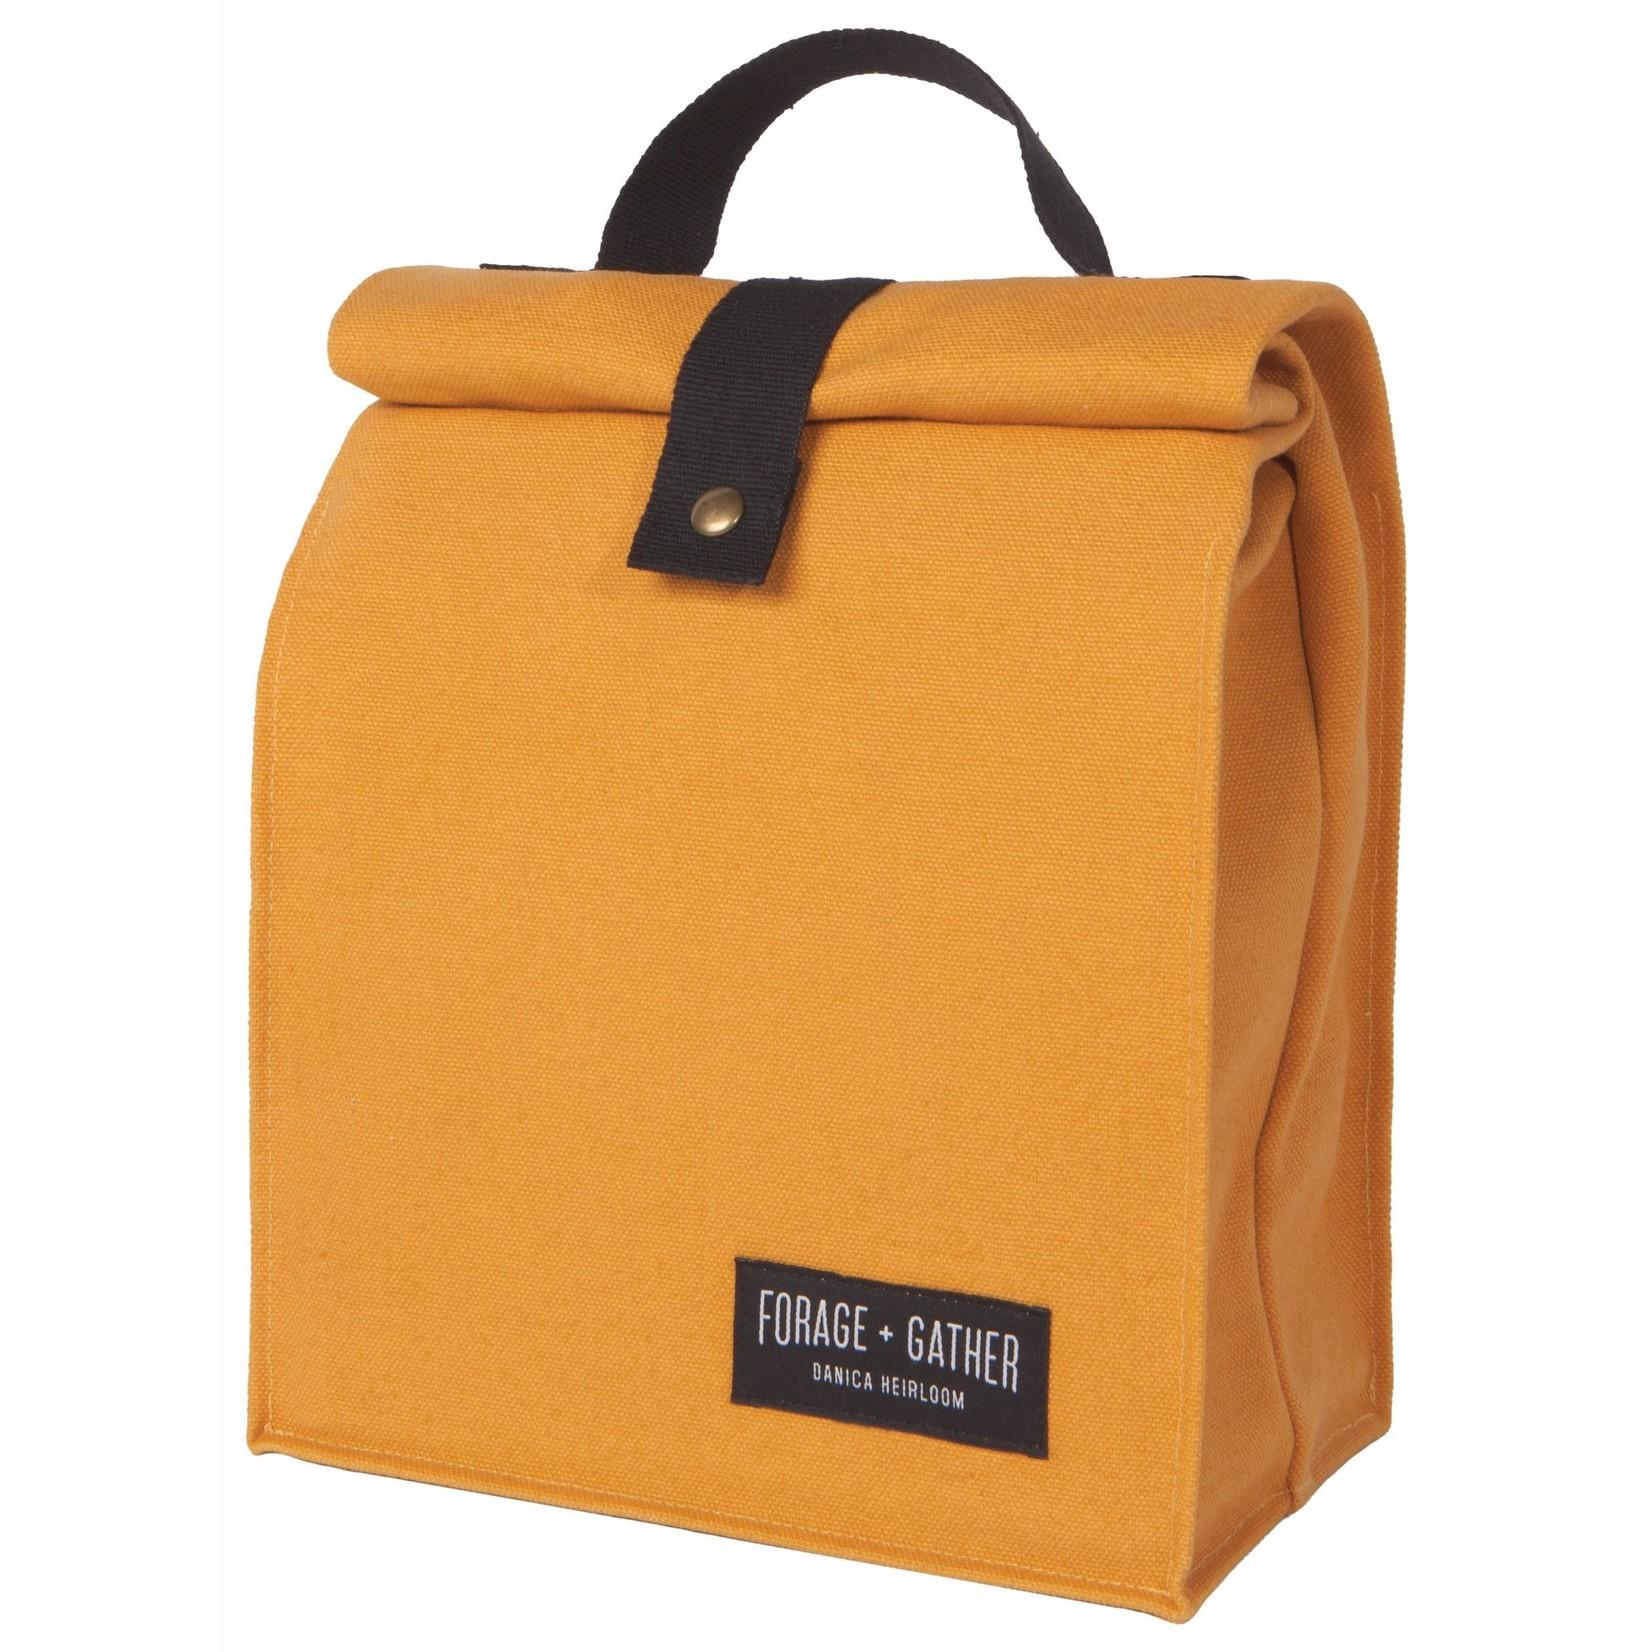 Heirloom Forage & Gather Lunch Bag